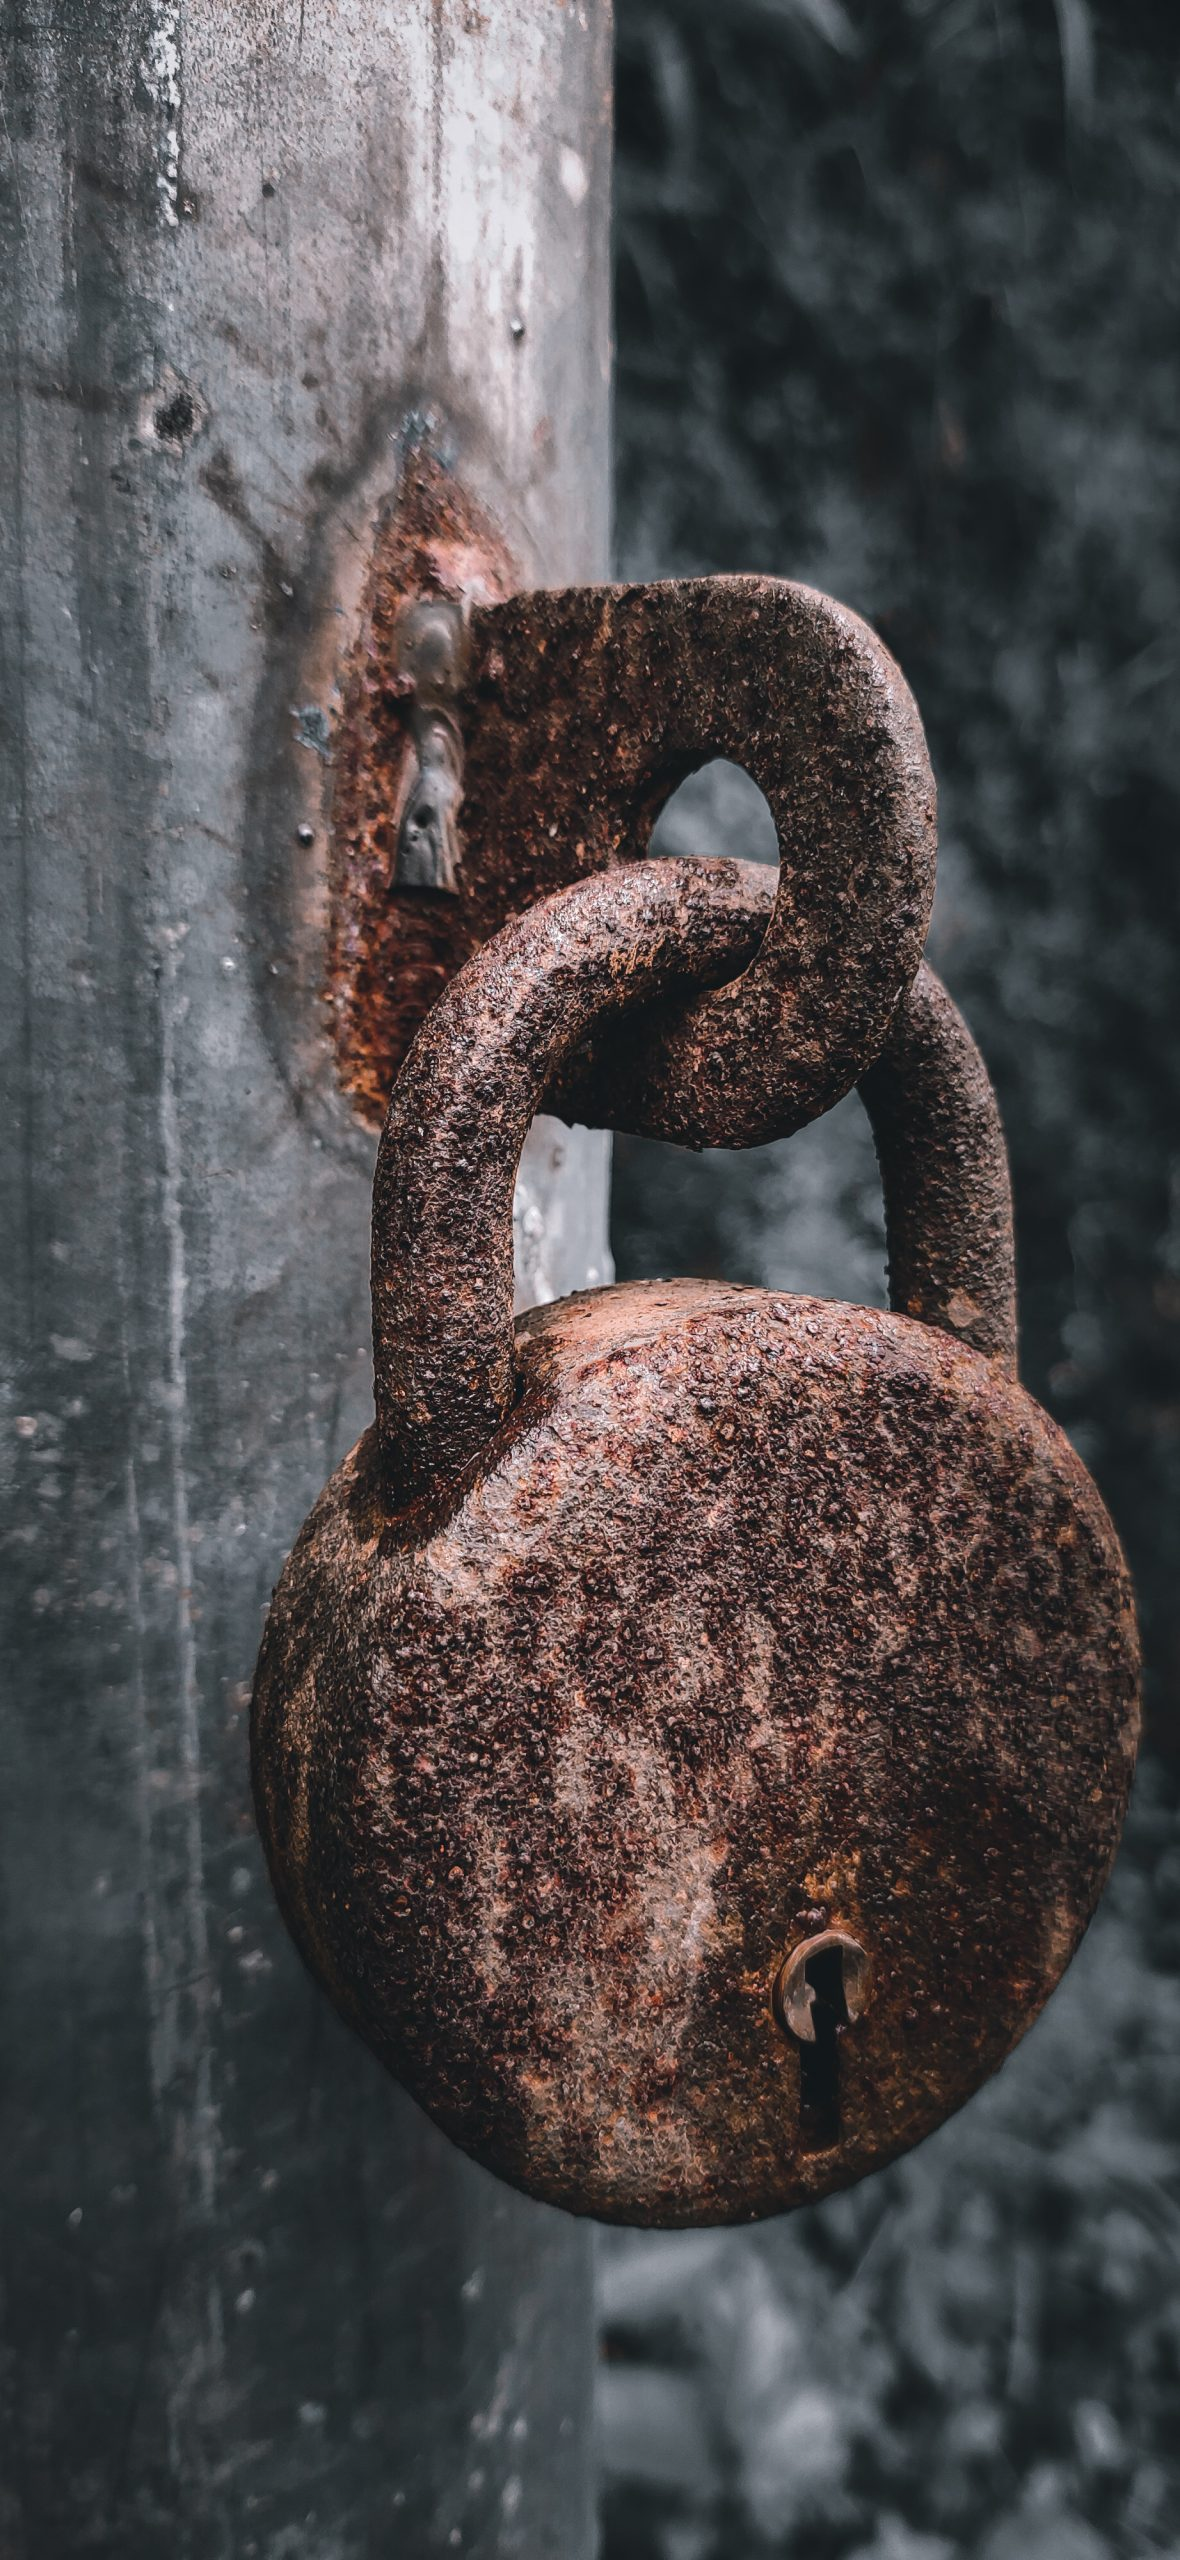 A Rusty Lock